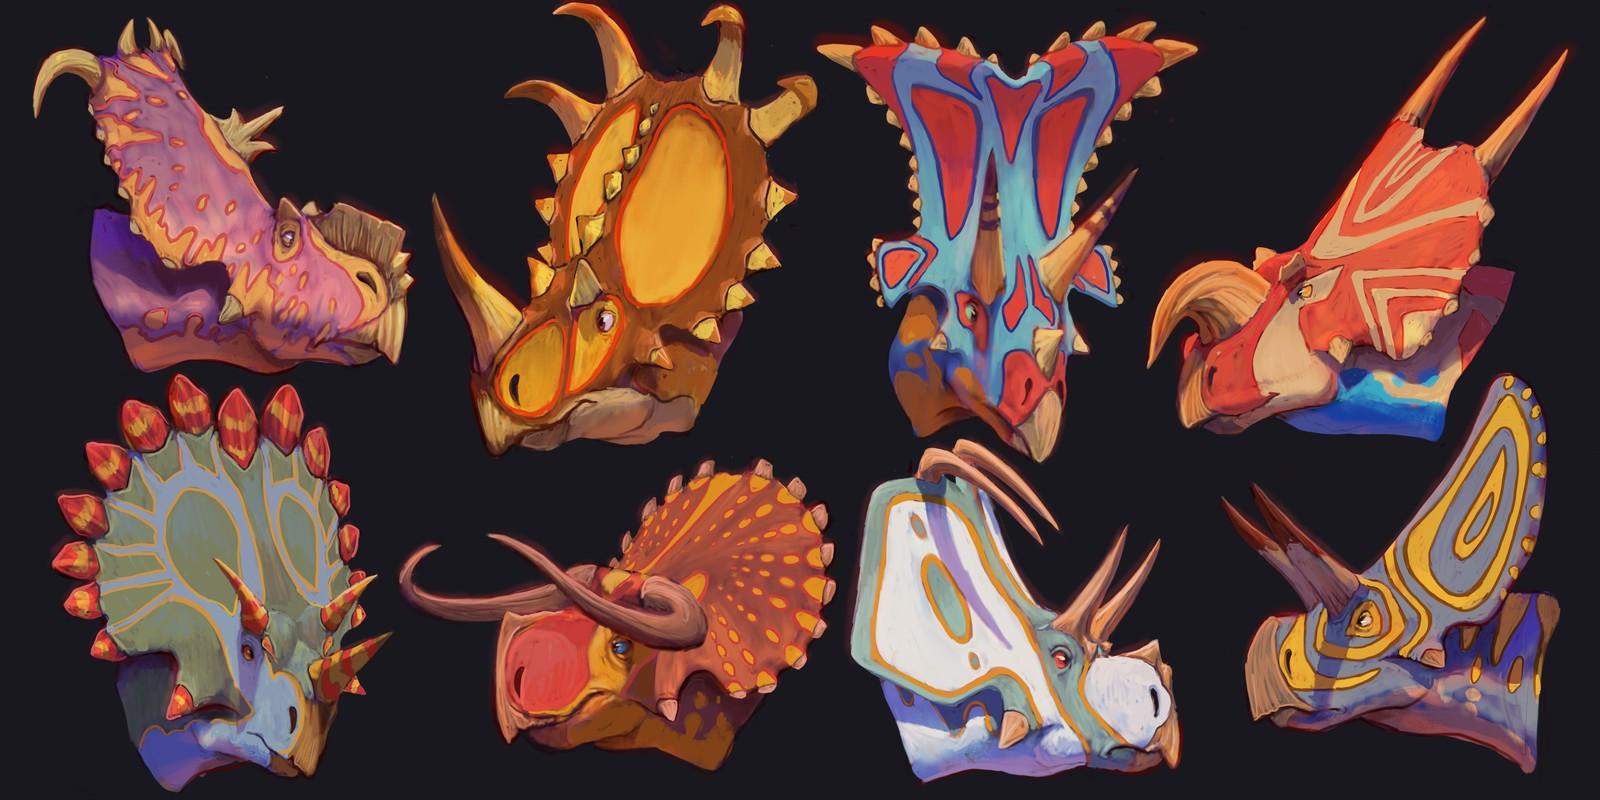 Ceratopsians